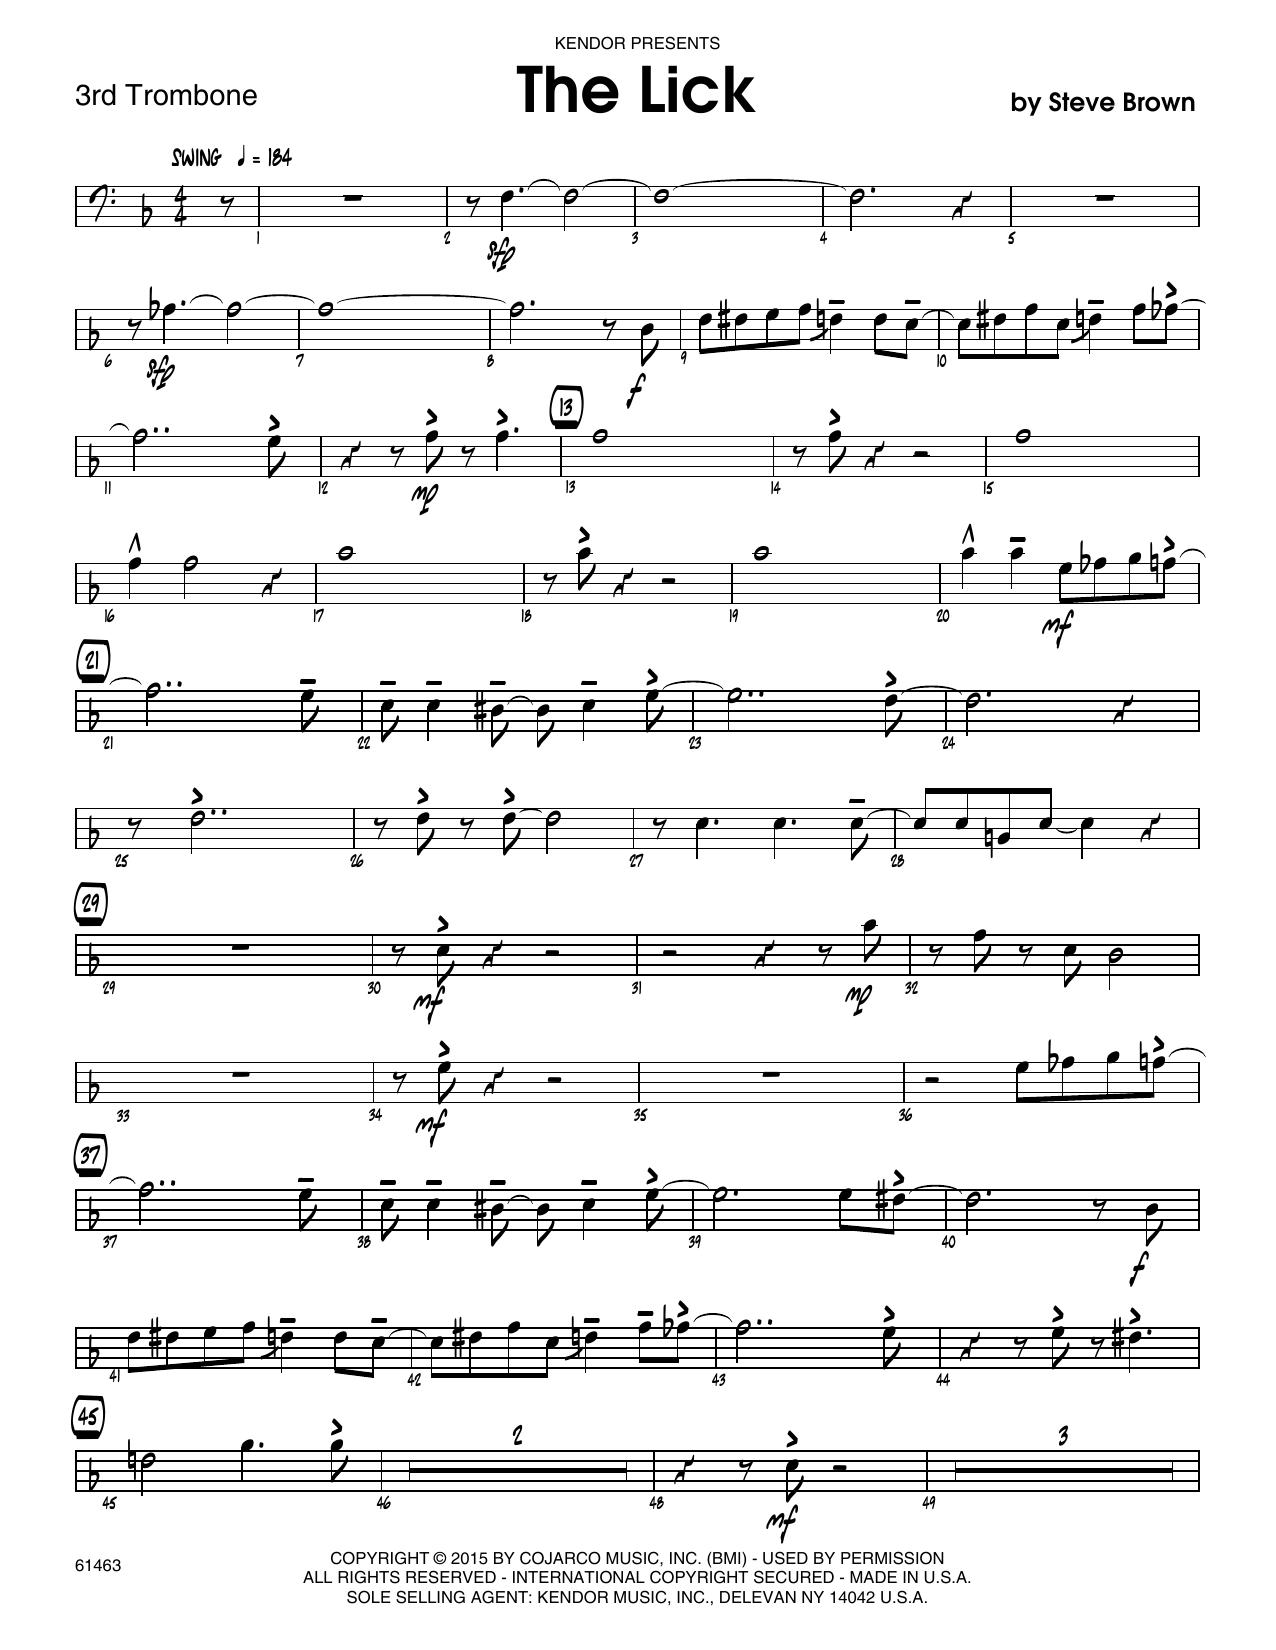 The Lick - 2nd Trombone